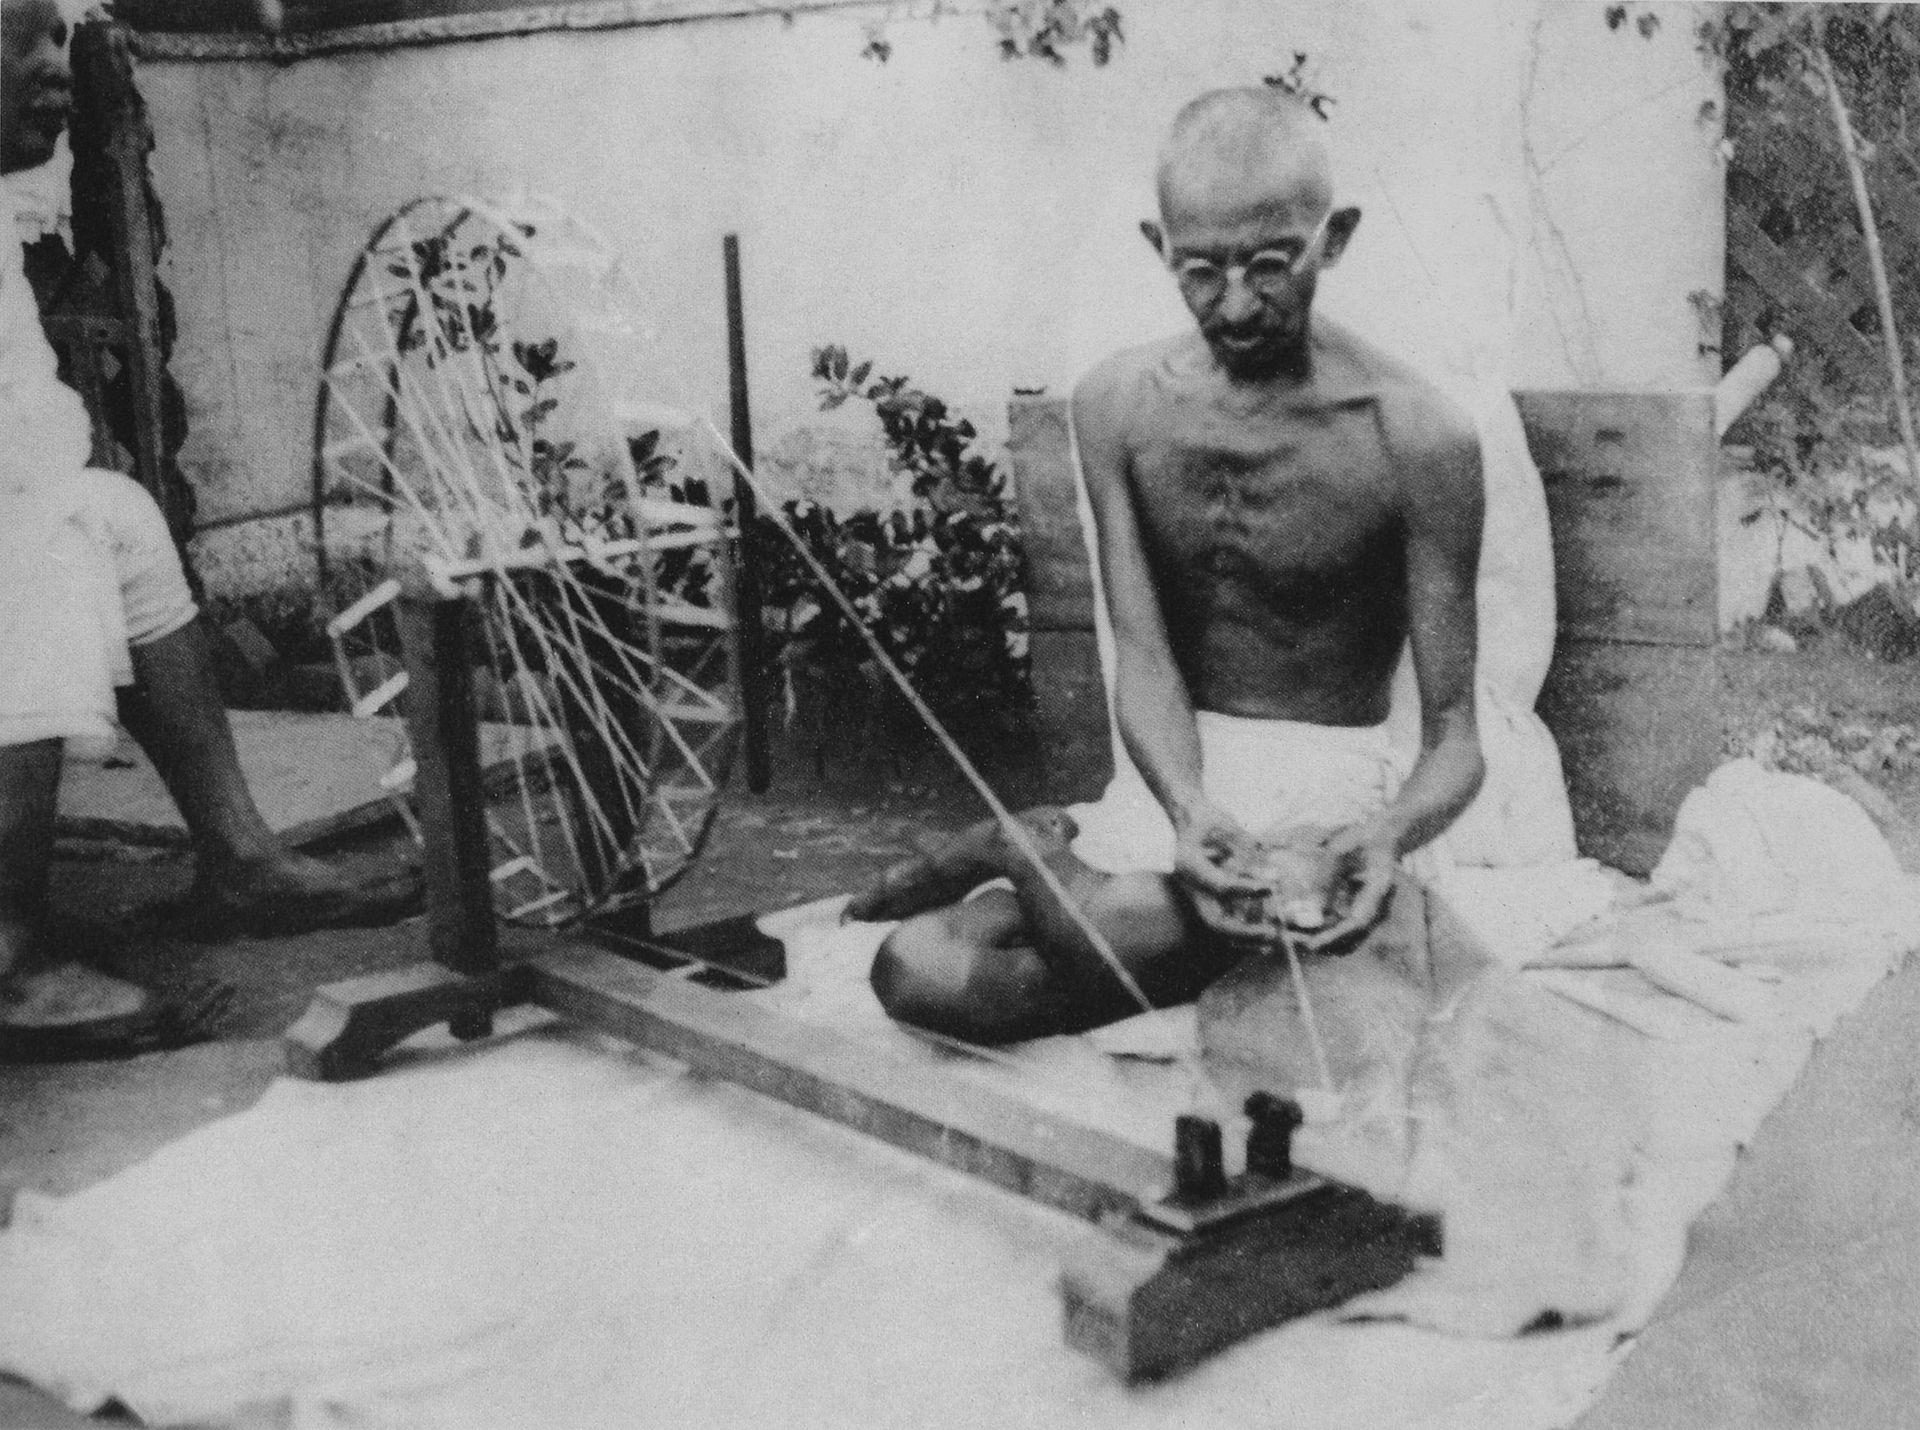 https://en.wikipedia.org/wiki/Mahatma_Gandhi